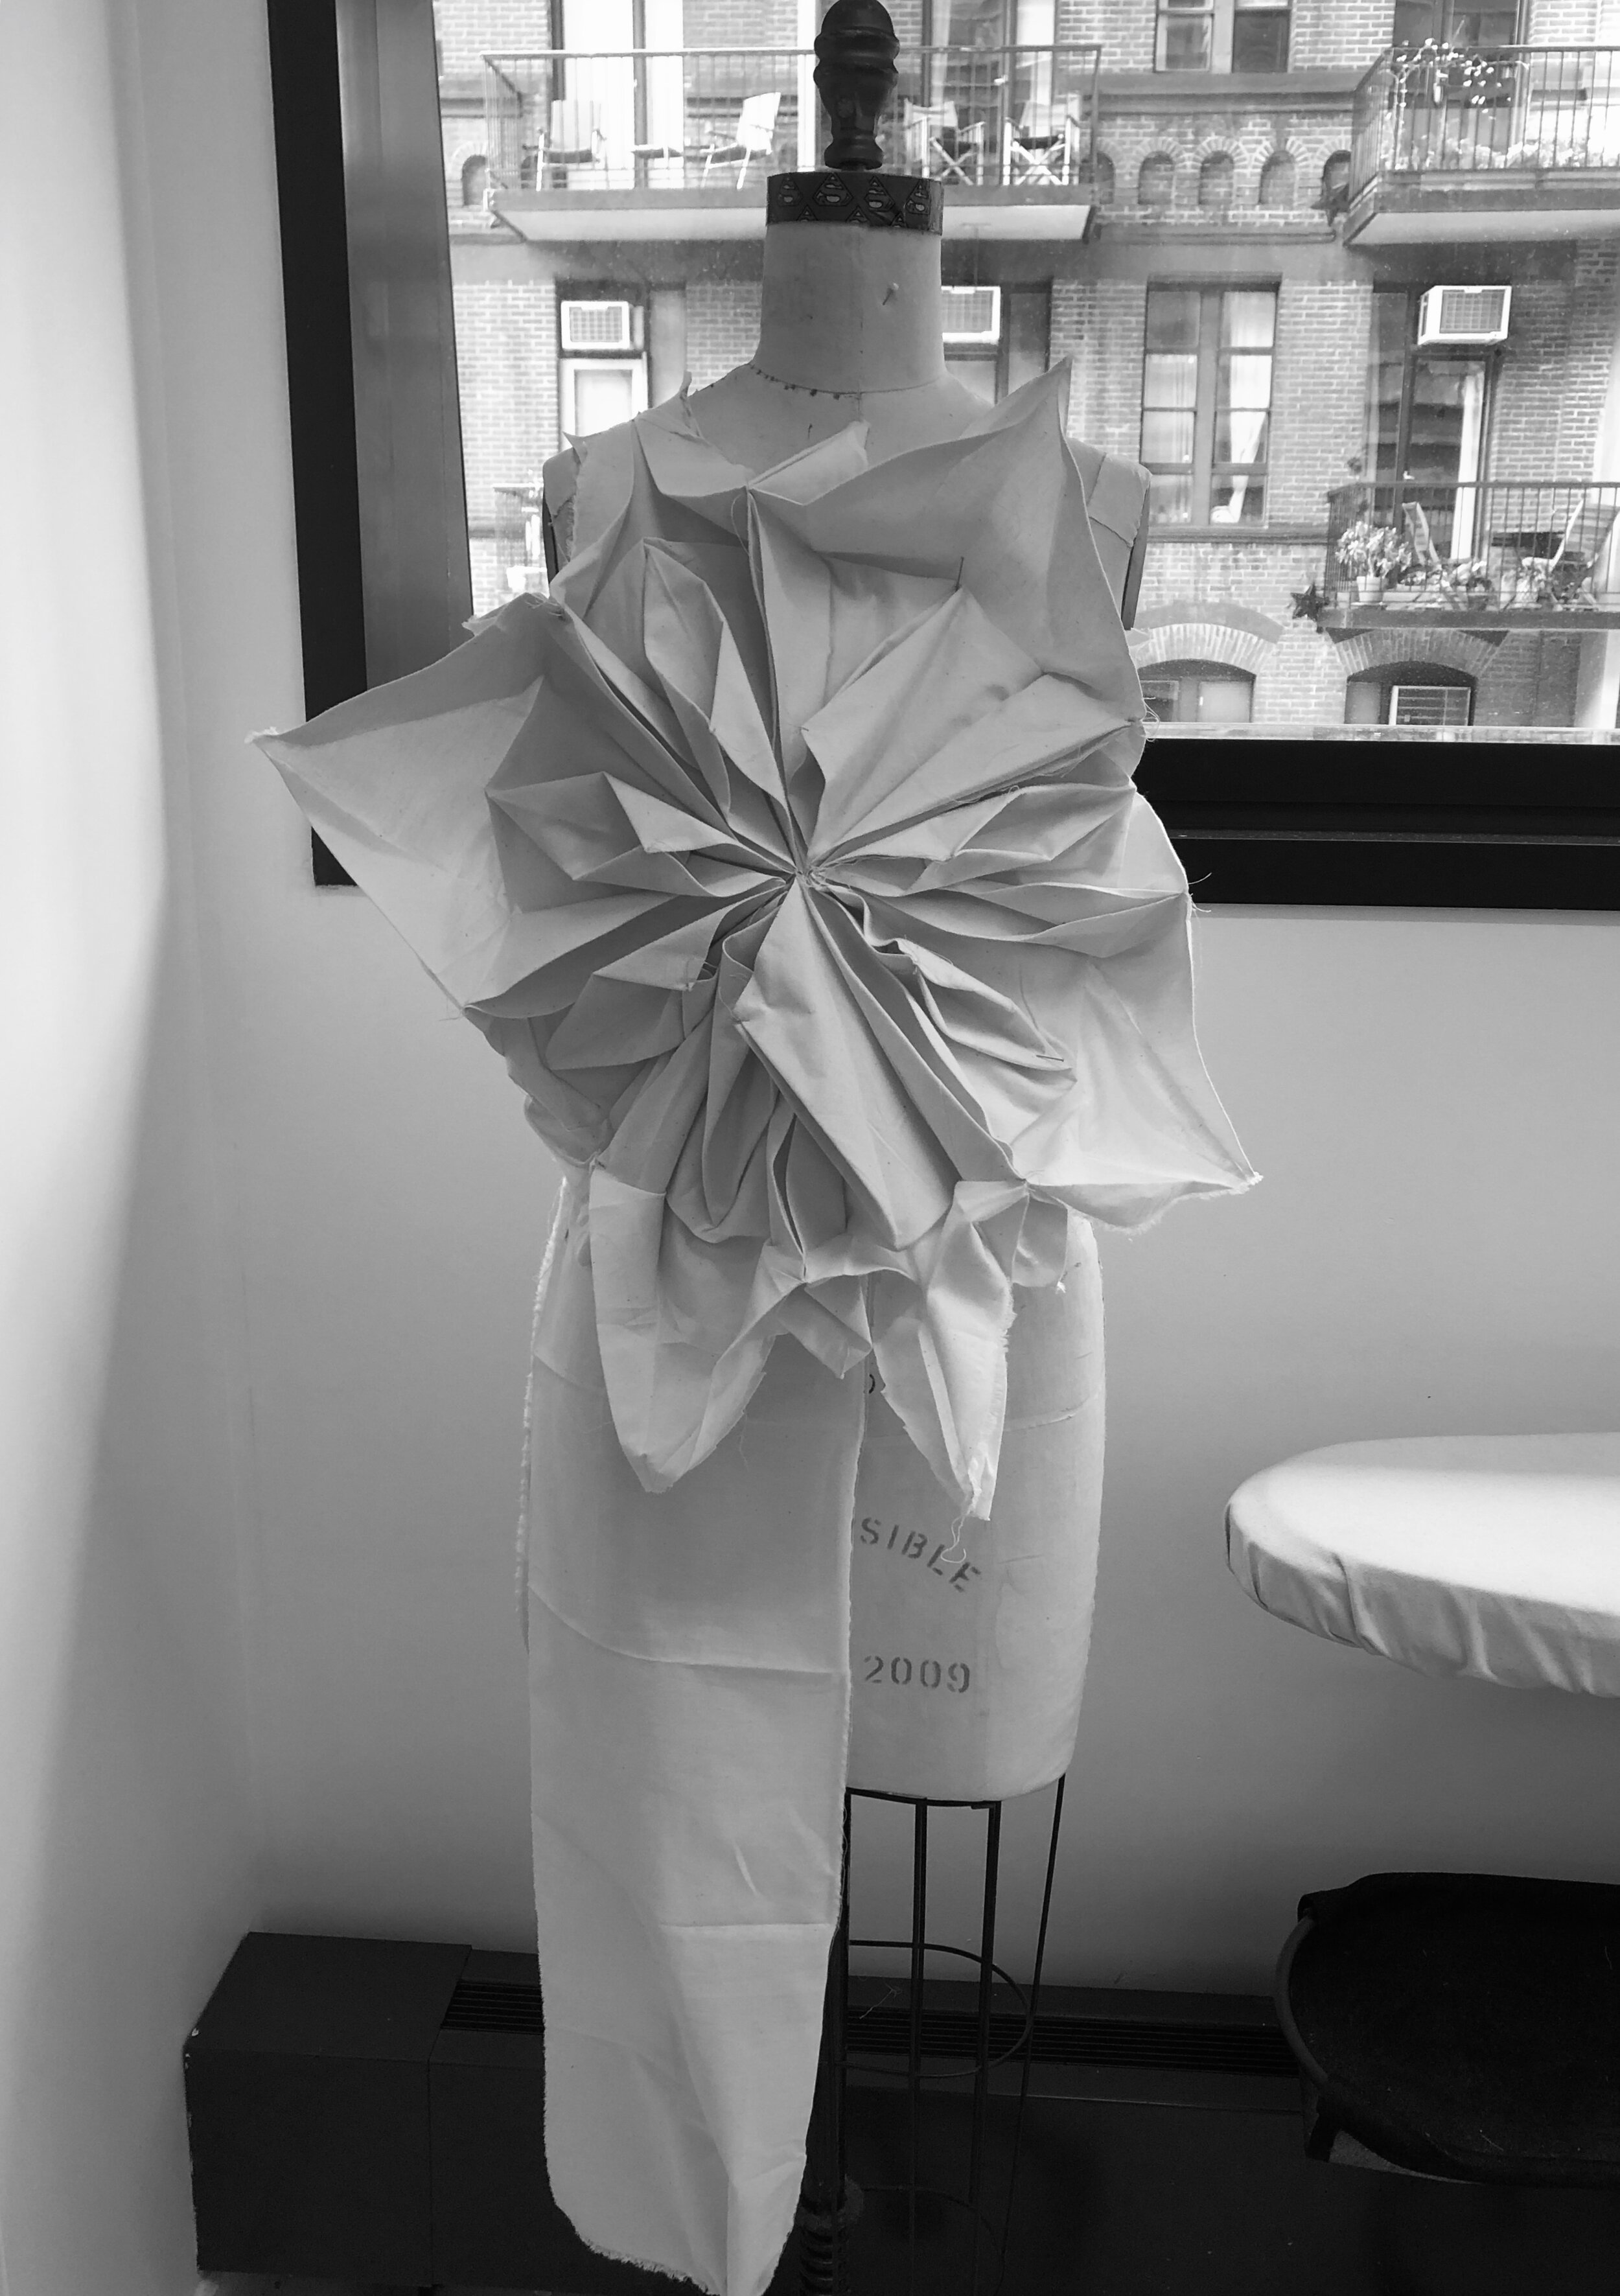 Origami eight-pointed chrysanthemum swatch. New York City, September 2019